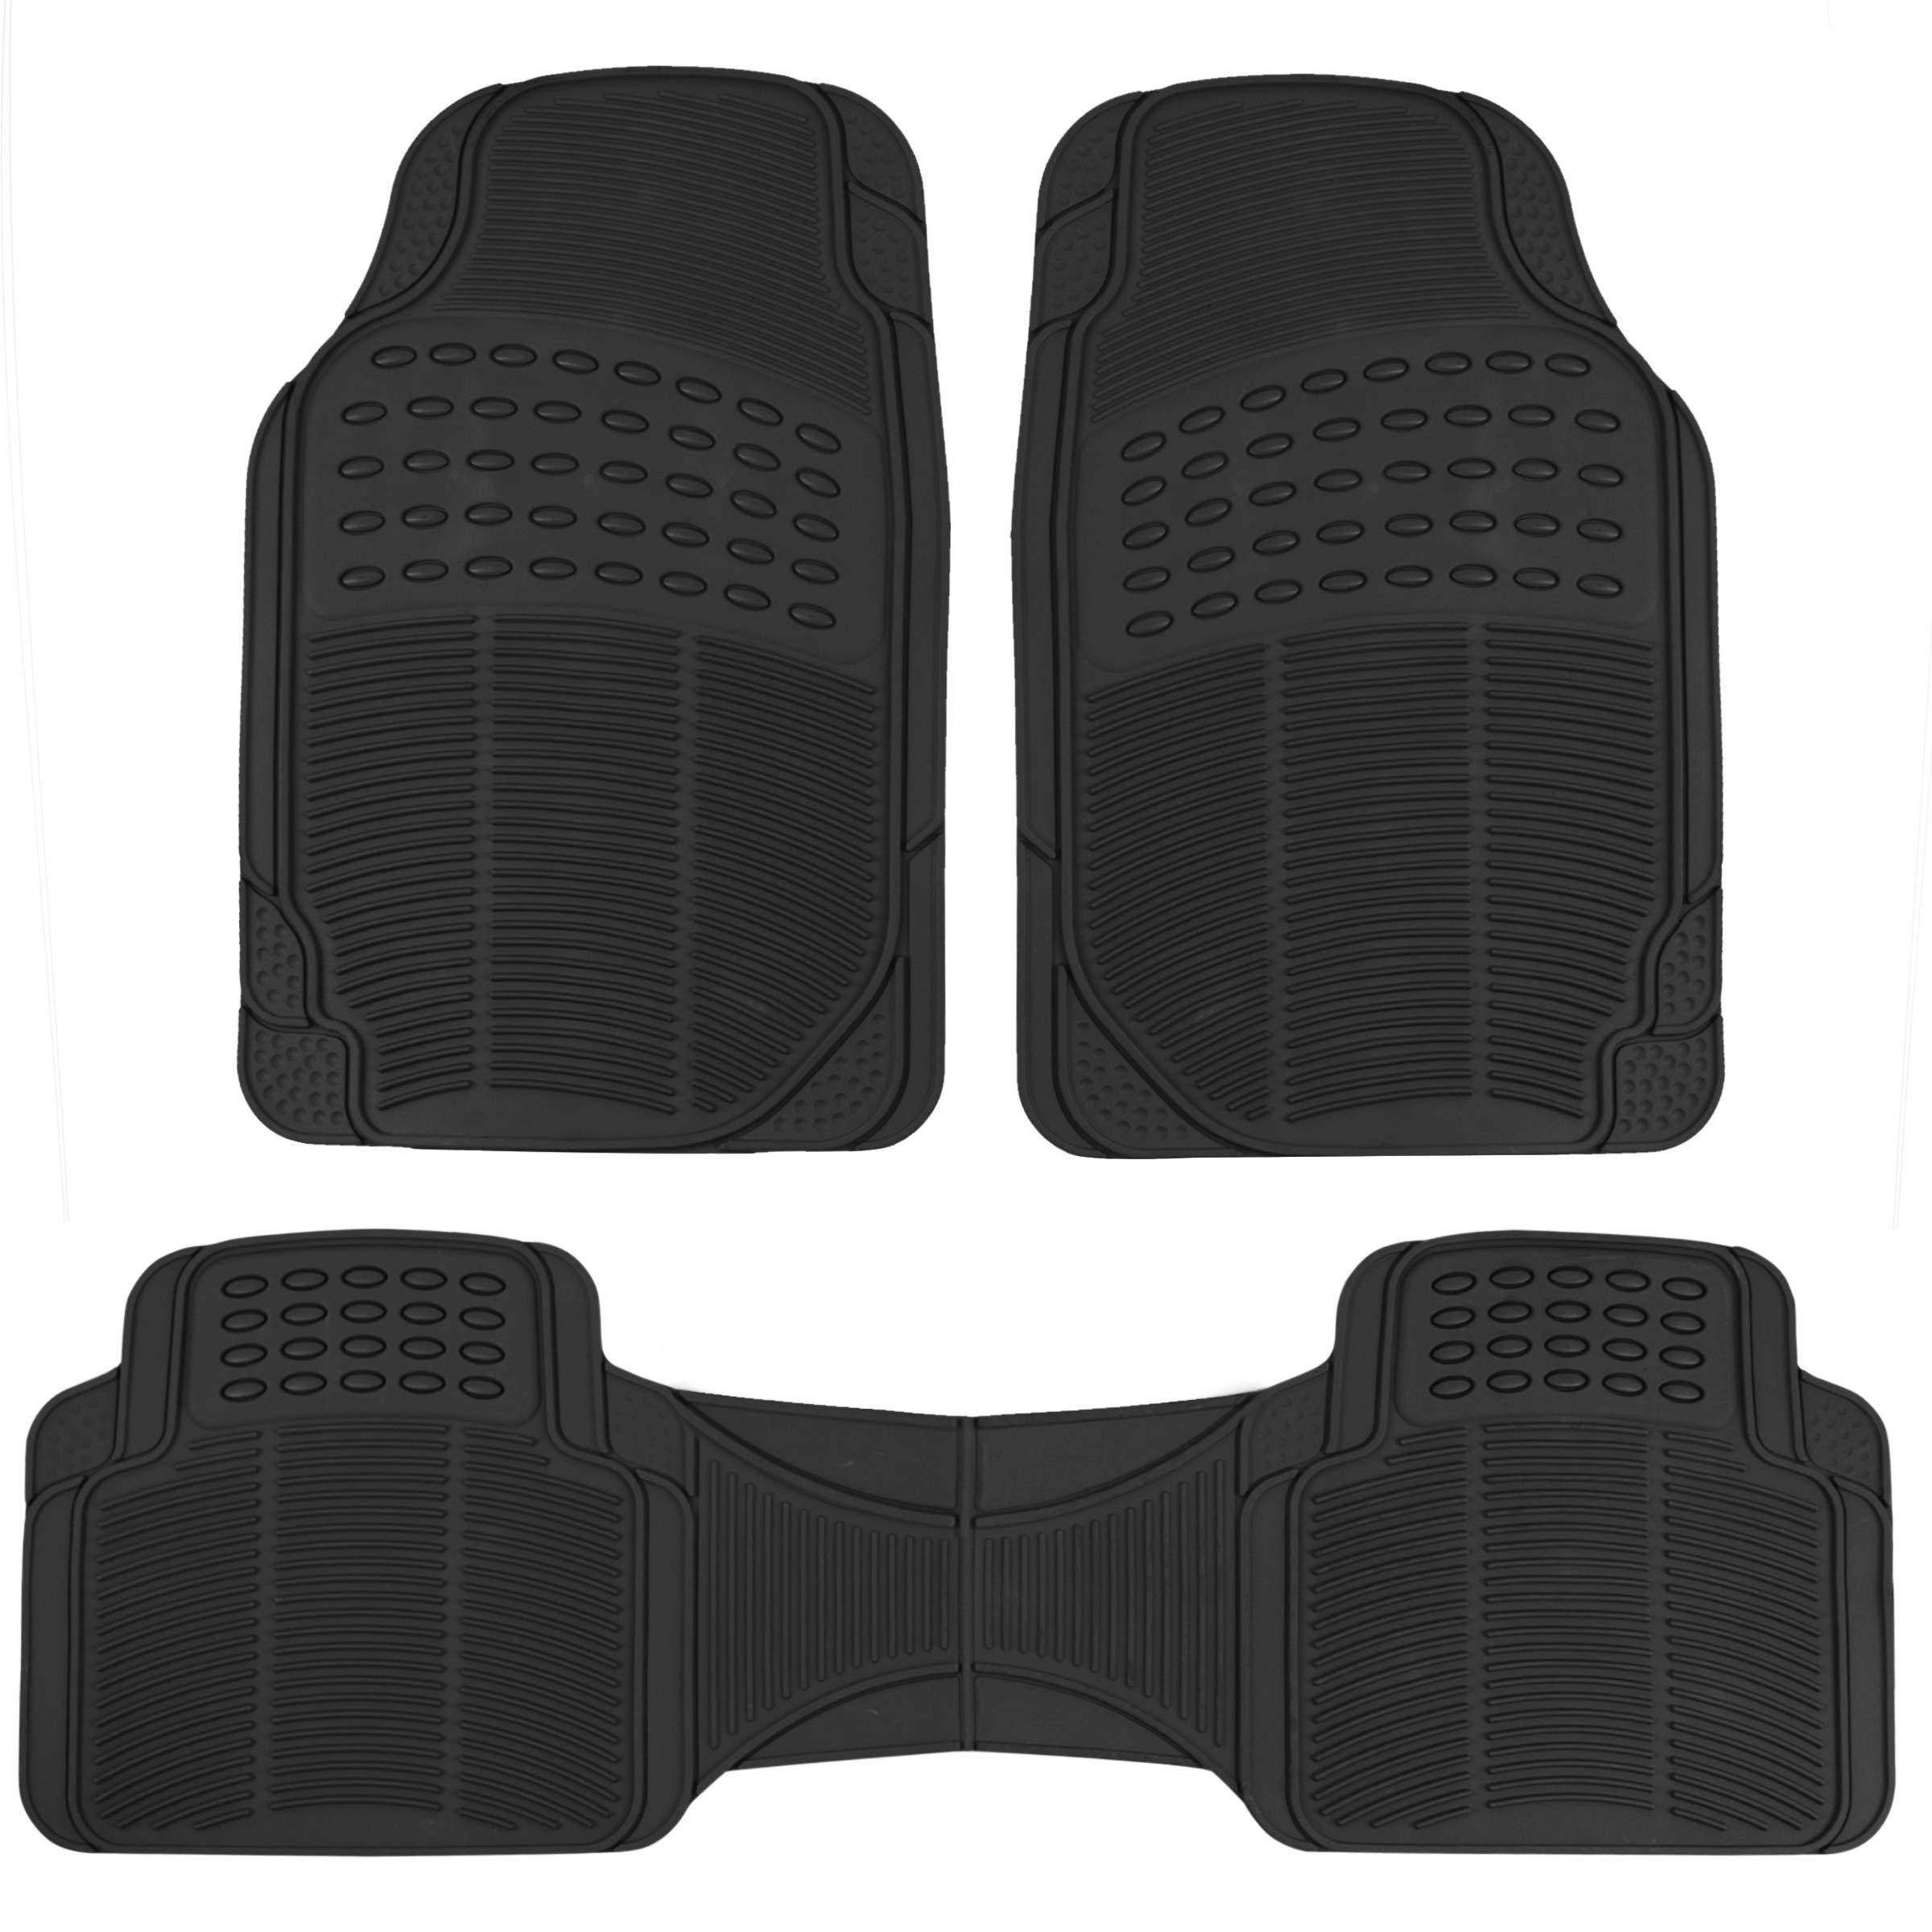 BDK MT783PLUS ProLiner Original 3pc Heavy-Duty Front & Rear Rubber Floor Mats for Car SUV Van & Truck - All Weather Protection Universal Fit (Black) by BDK